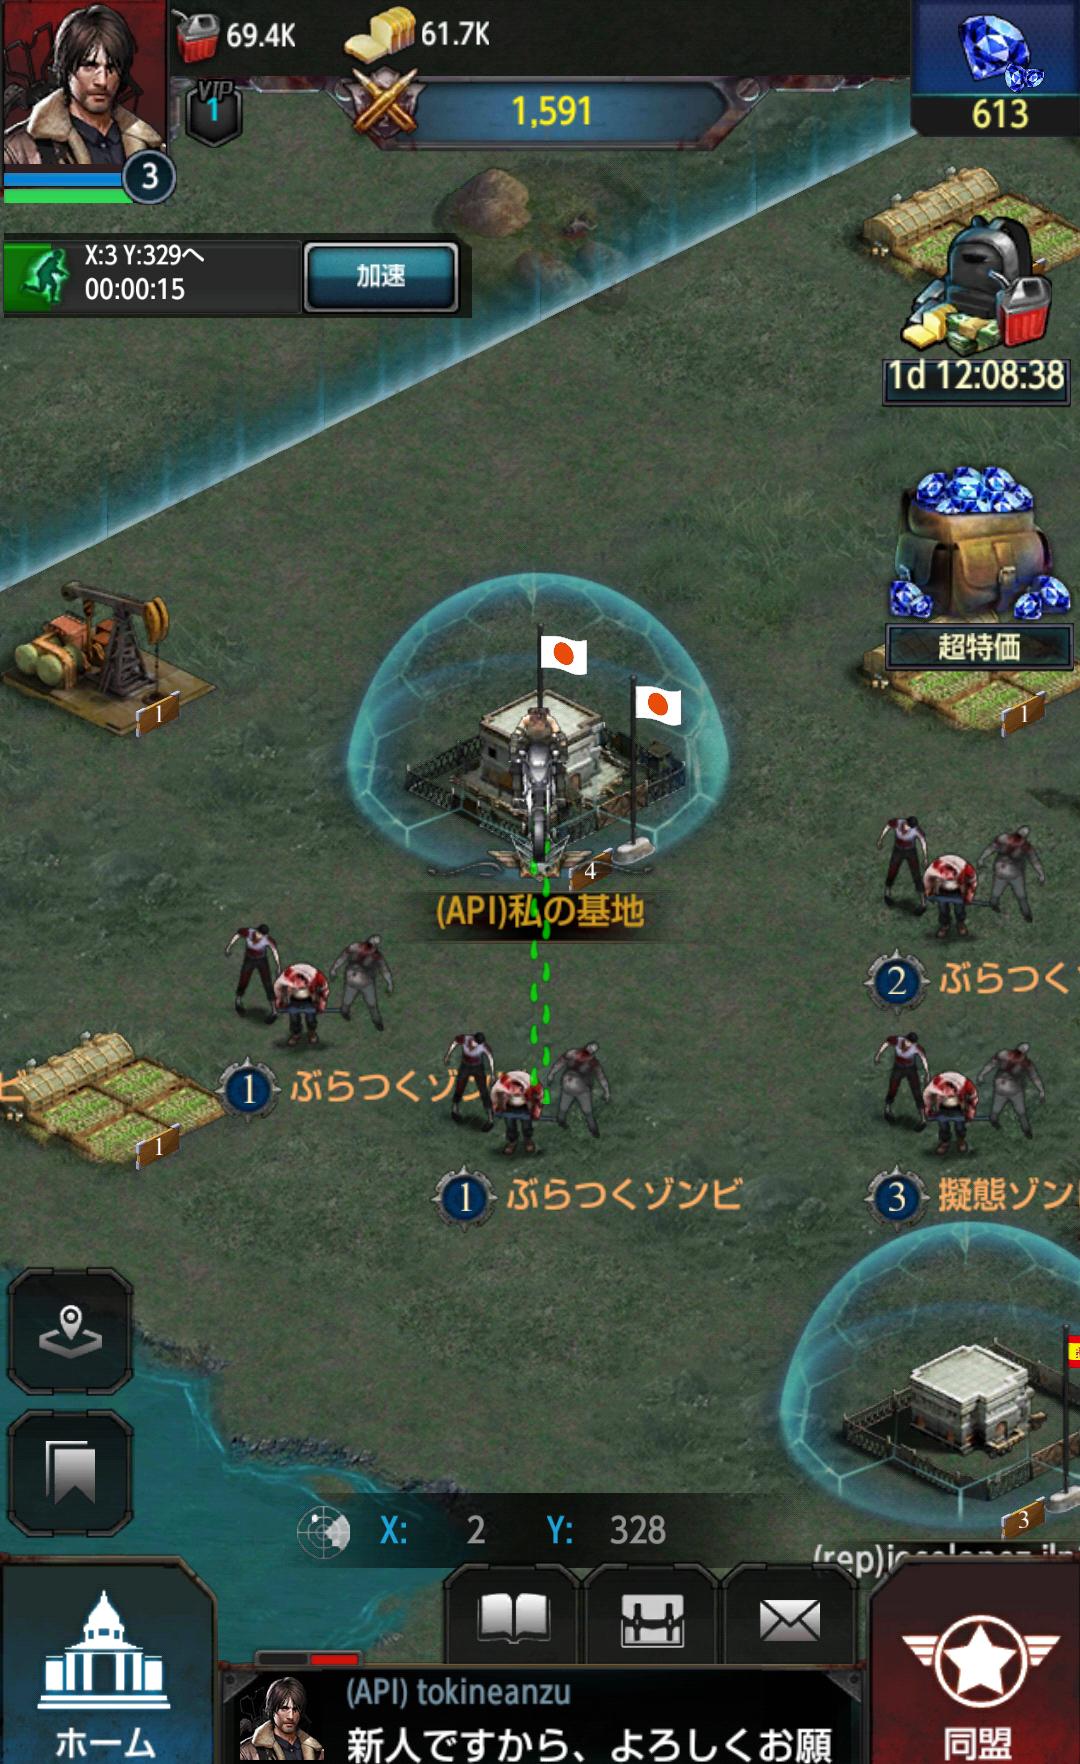 androidアプリ Last Empire-War Z攻略スクリーンショット4